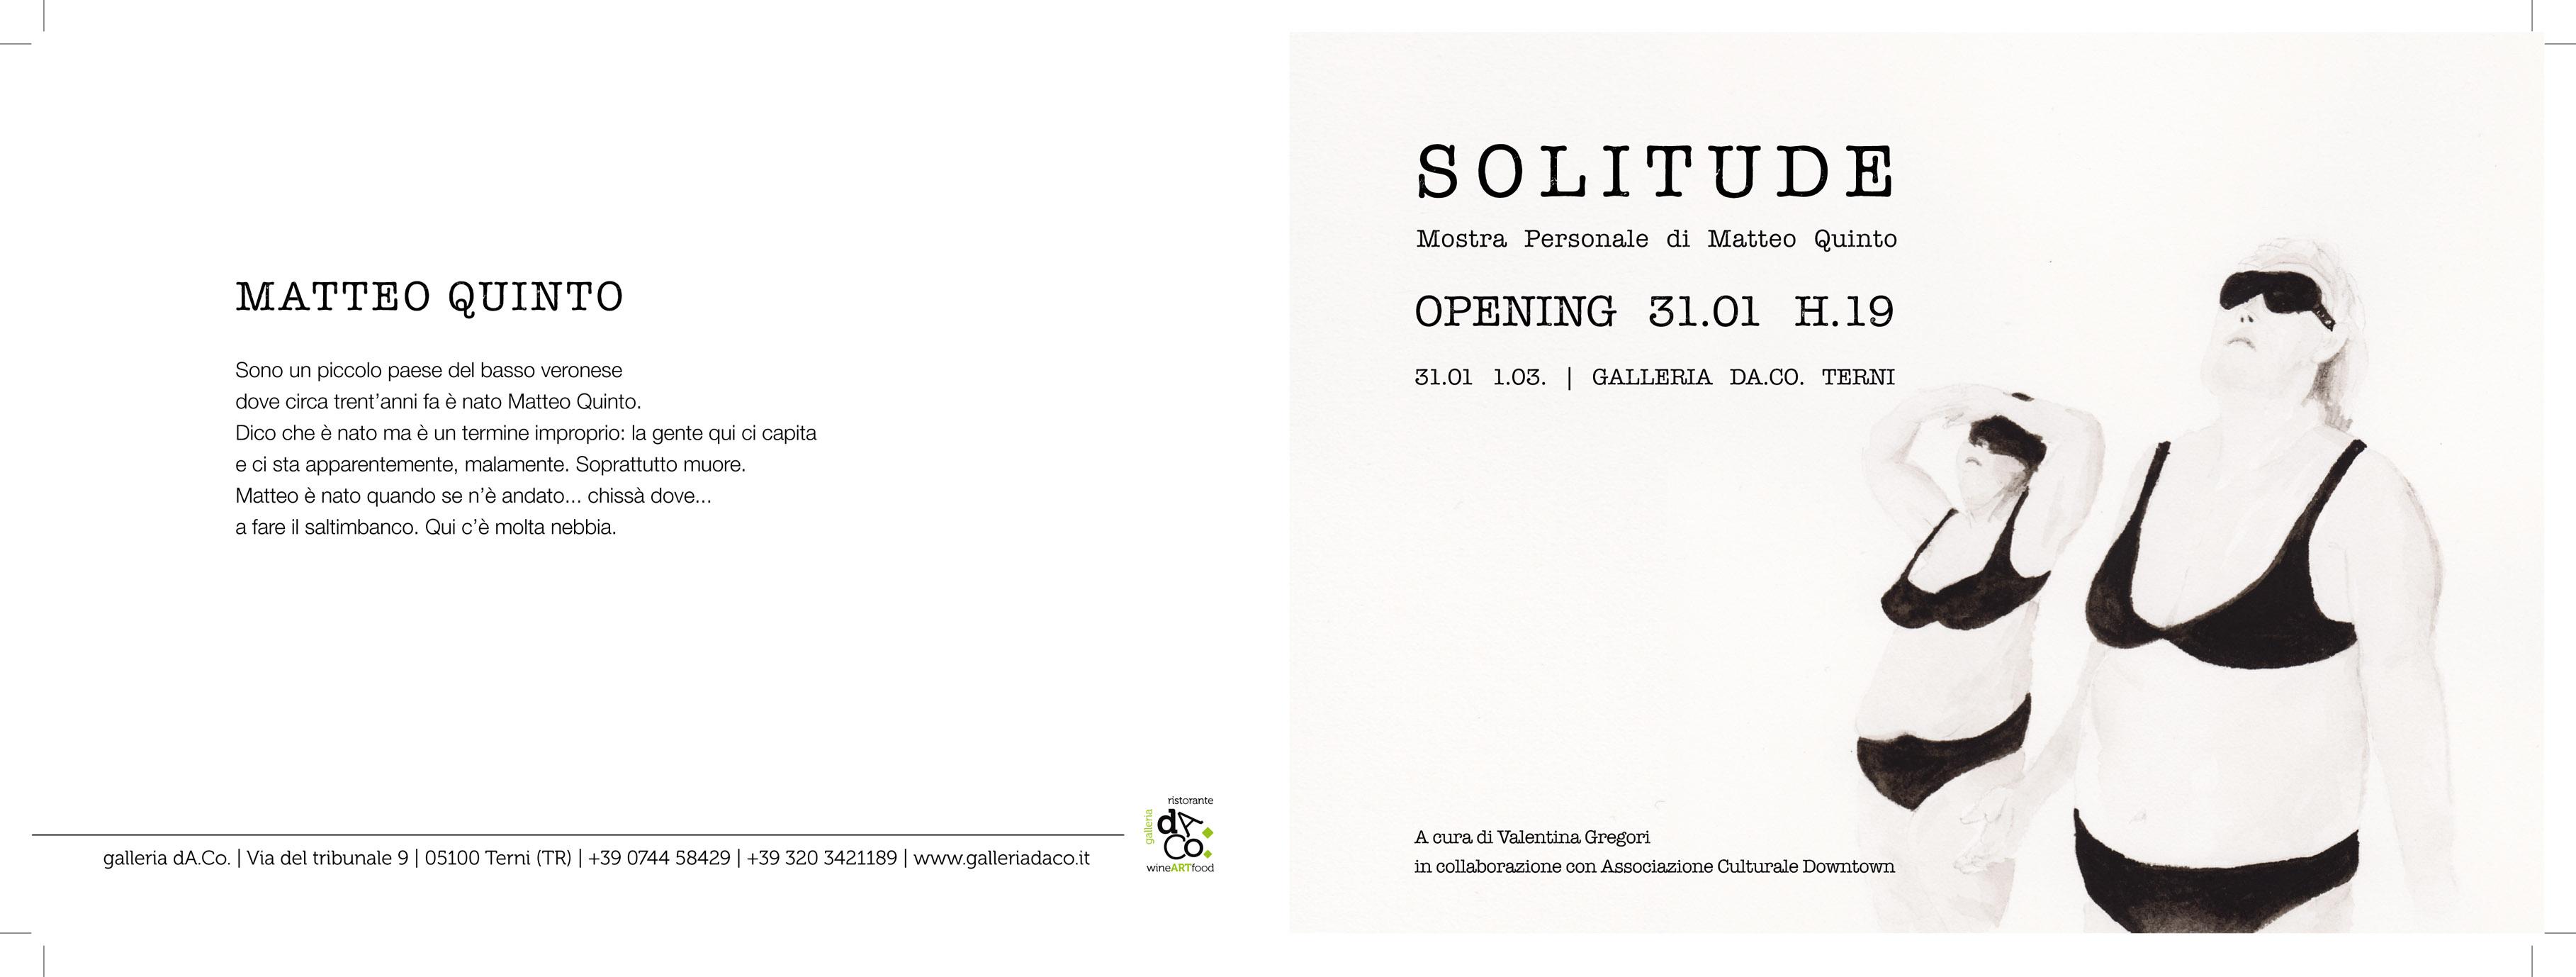 solitude-front